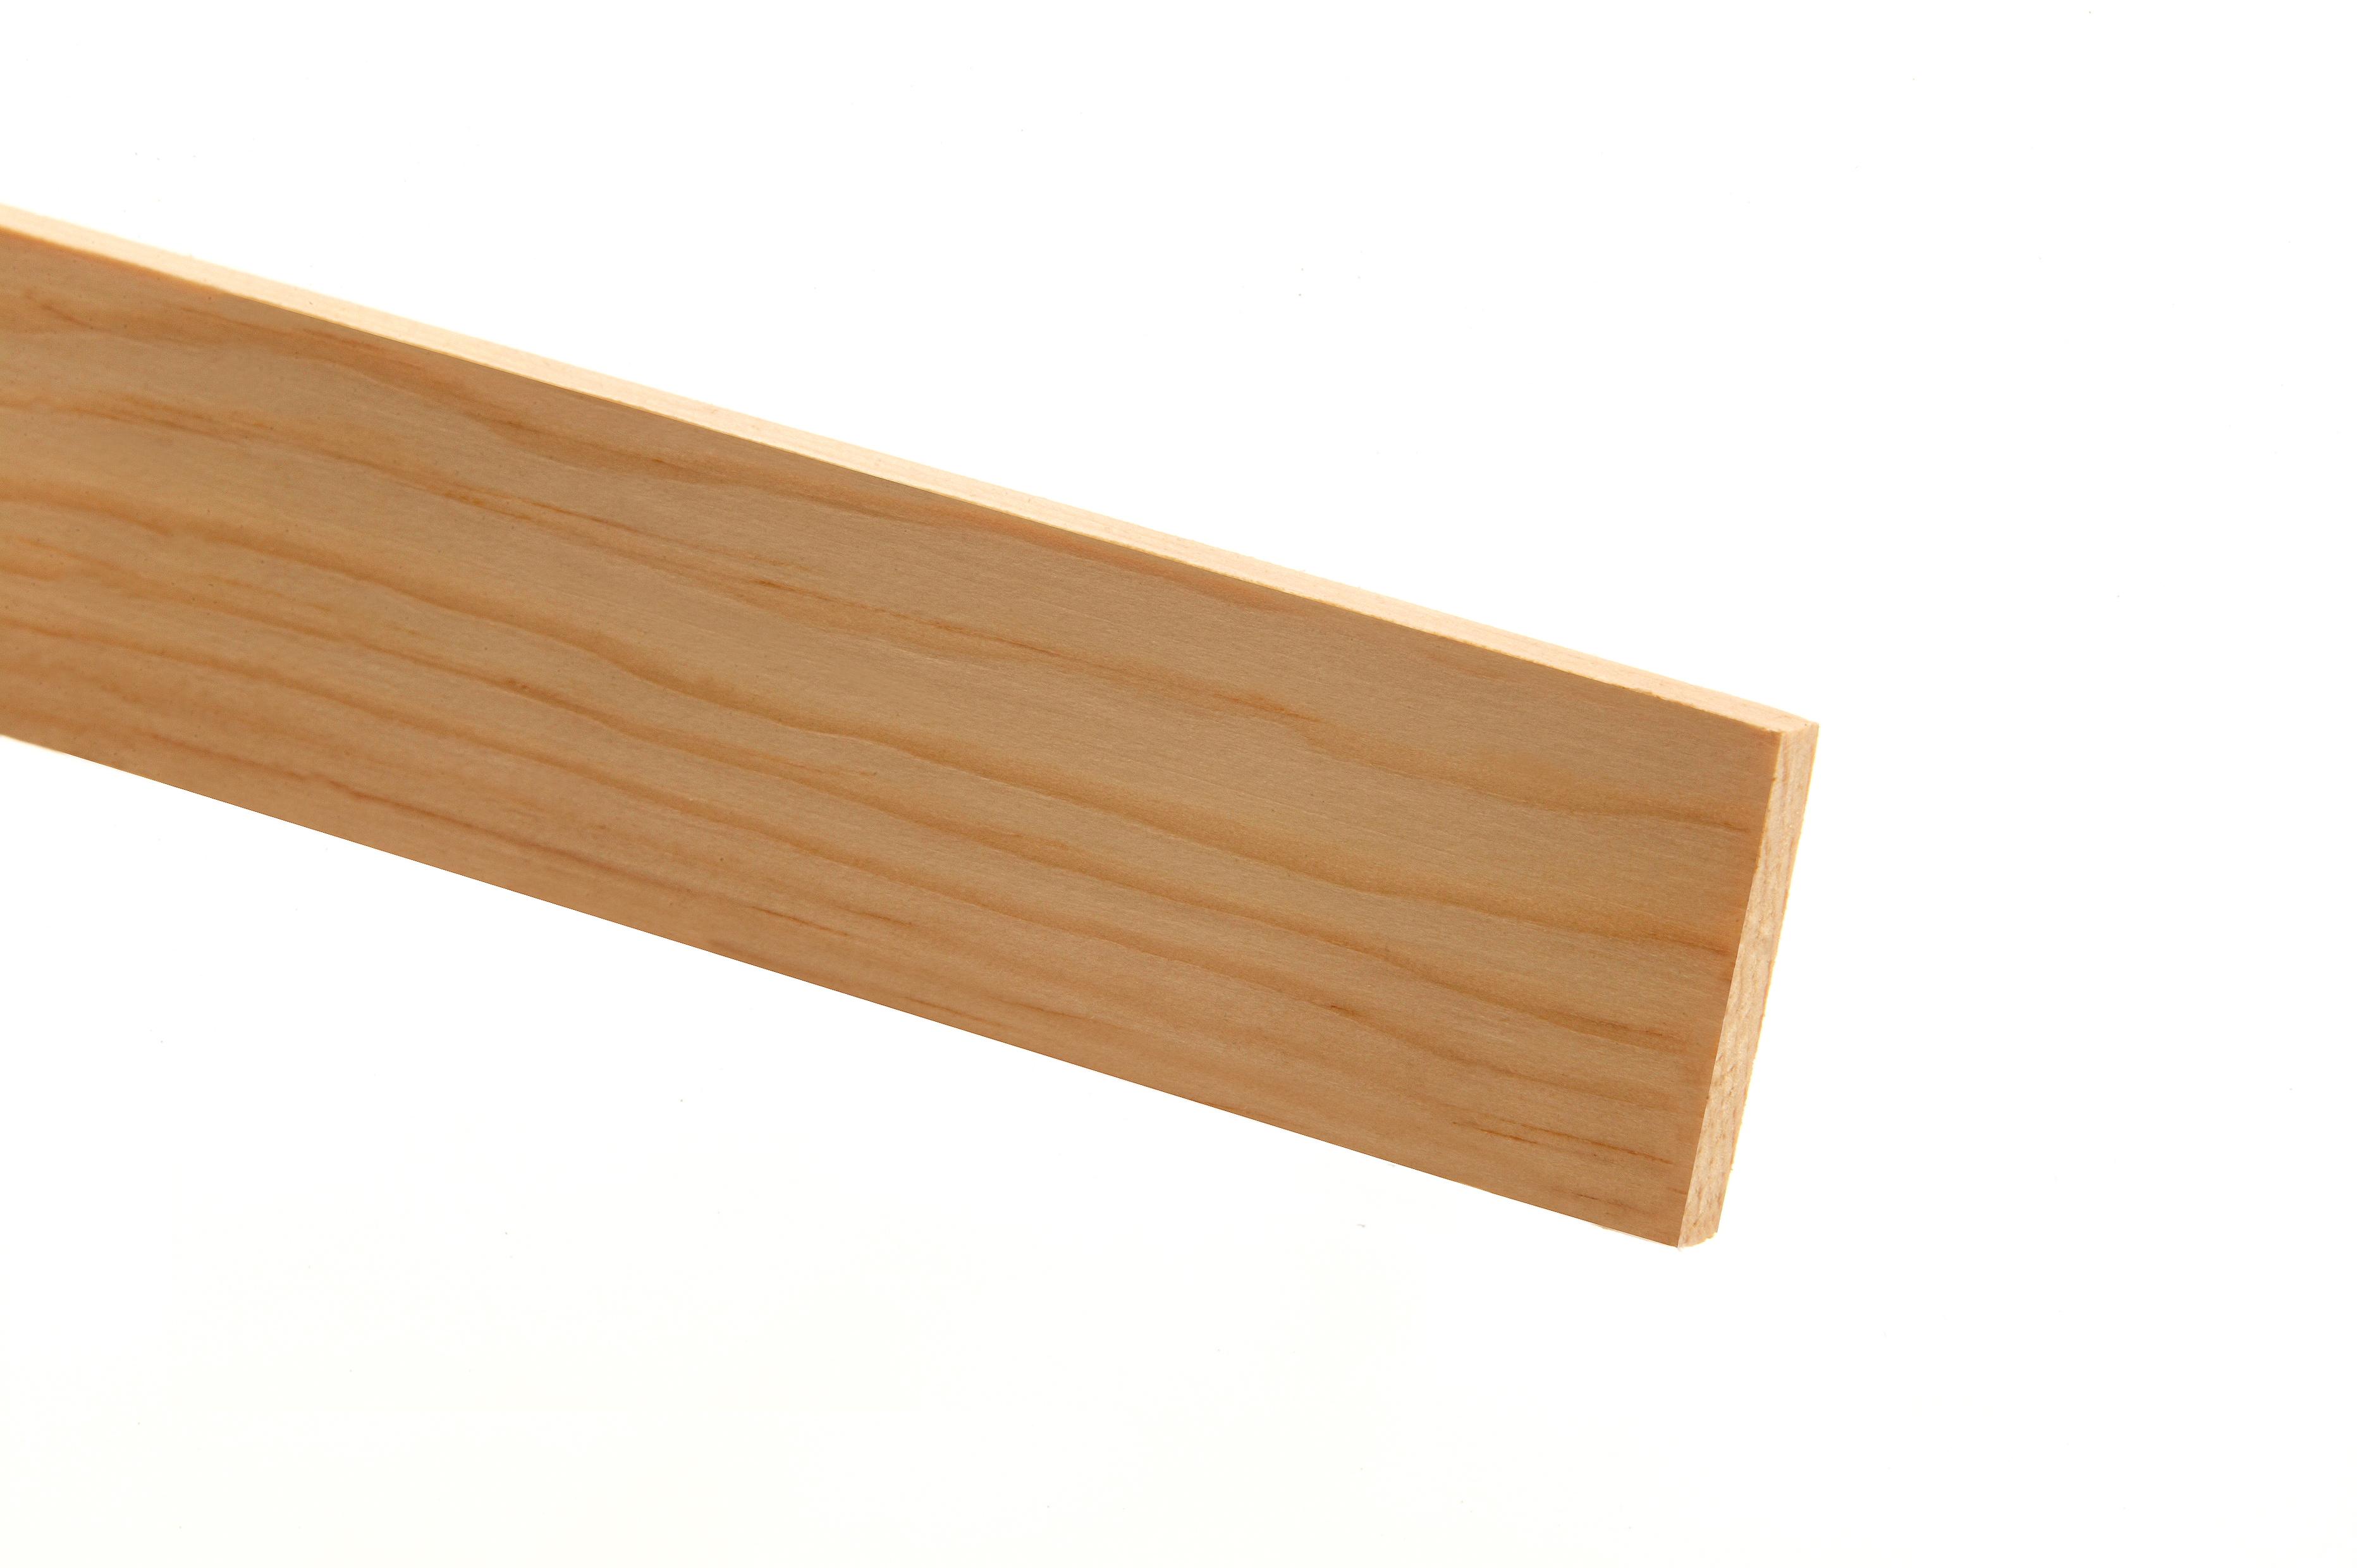 20 Pine PSE Stripwood 12 x 45 x 2400mm